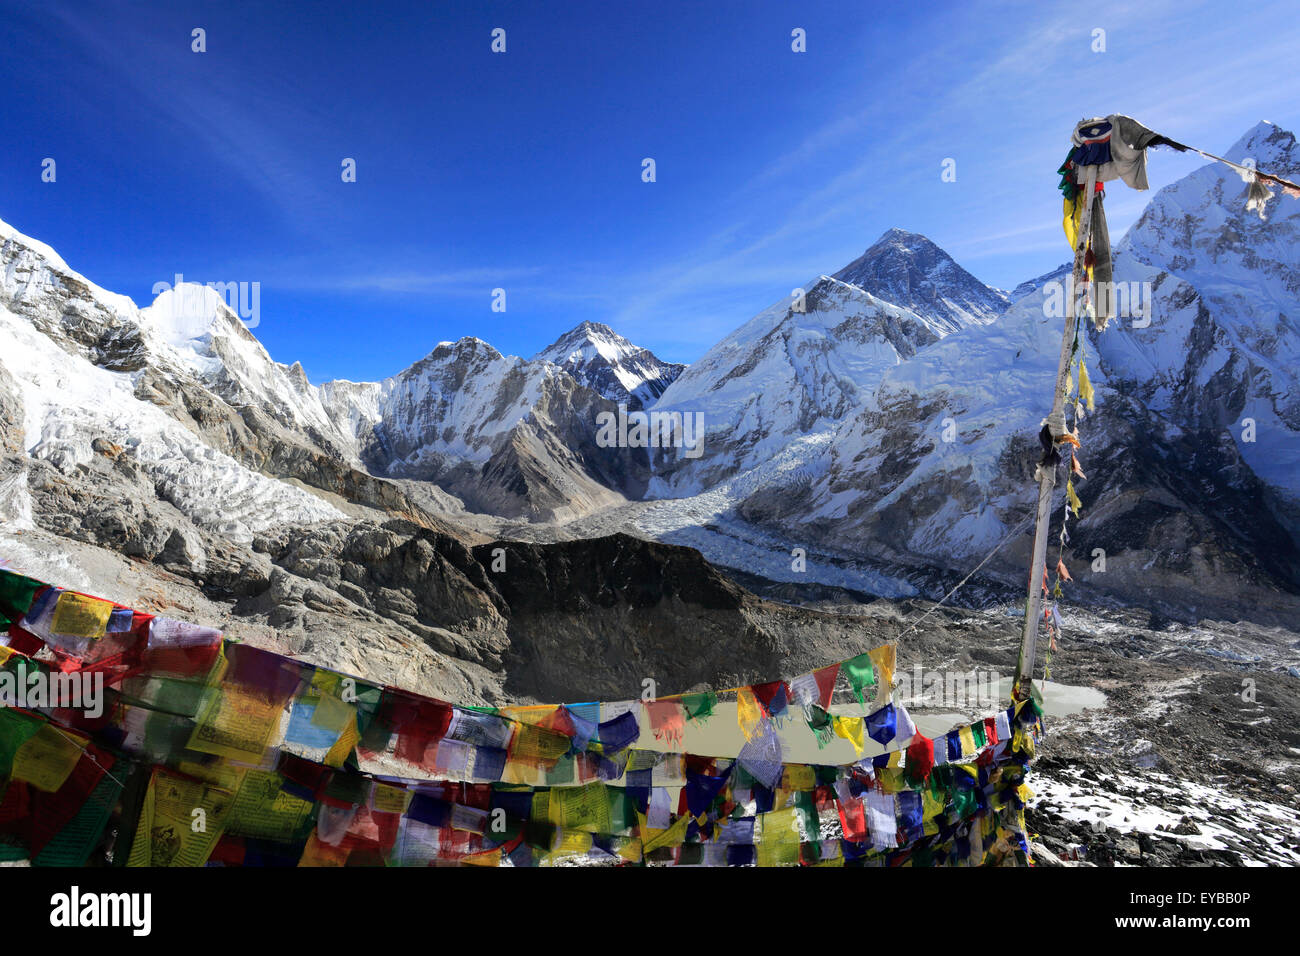 Summit of Mount Everest 8848M, Everest base camp trek, Sagarmatha National Park, UNESCO World Heritage Site, Solu - Stock Image